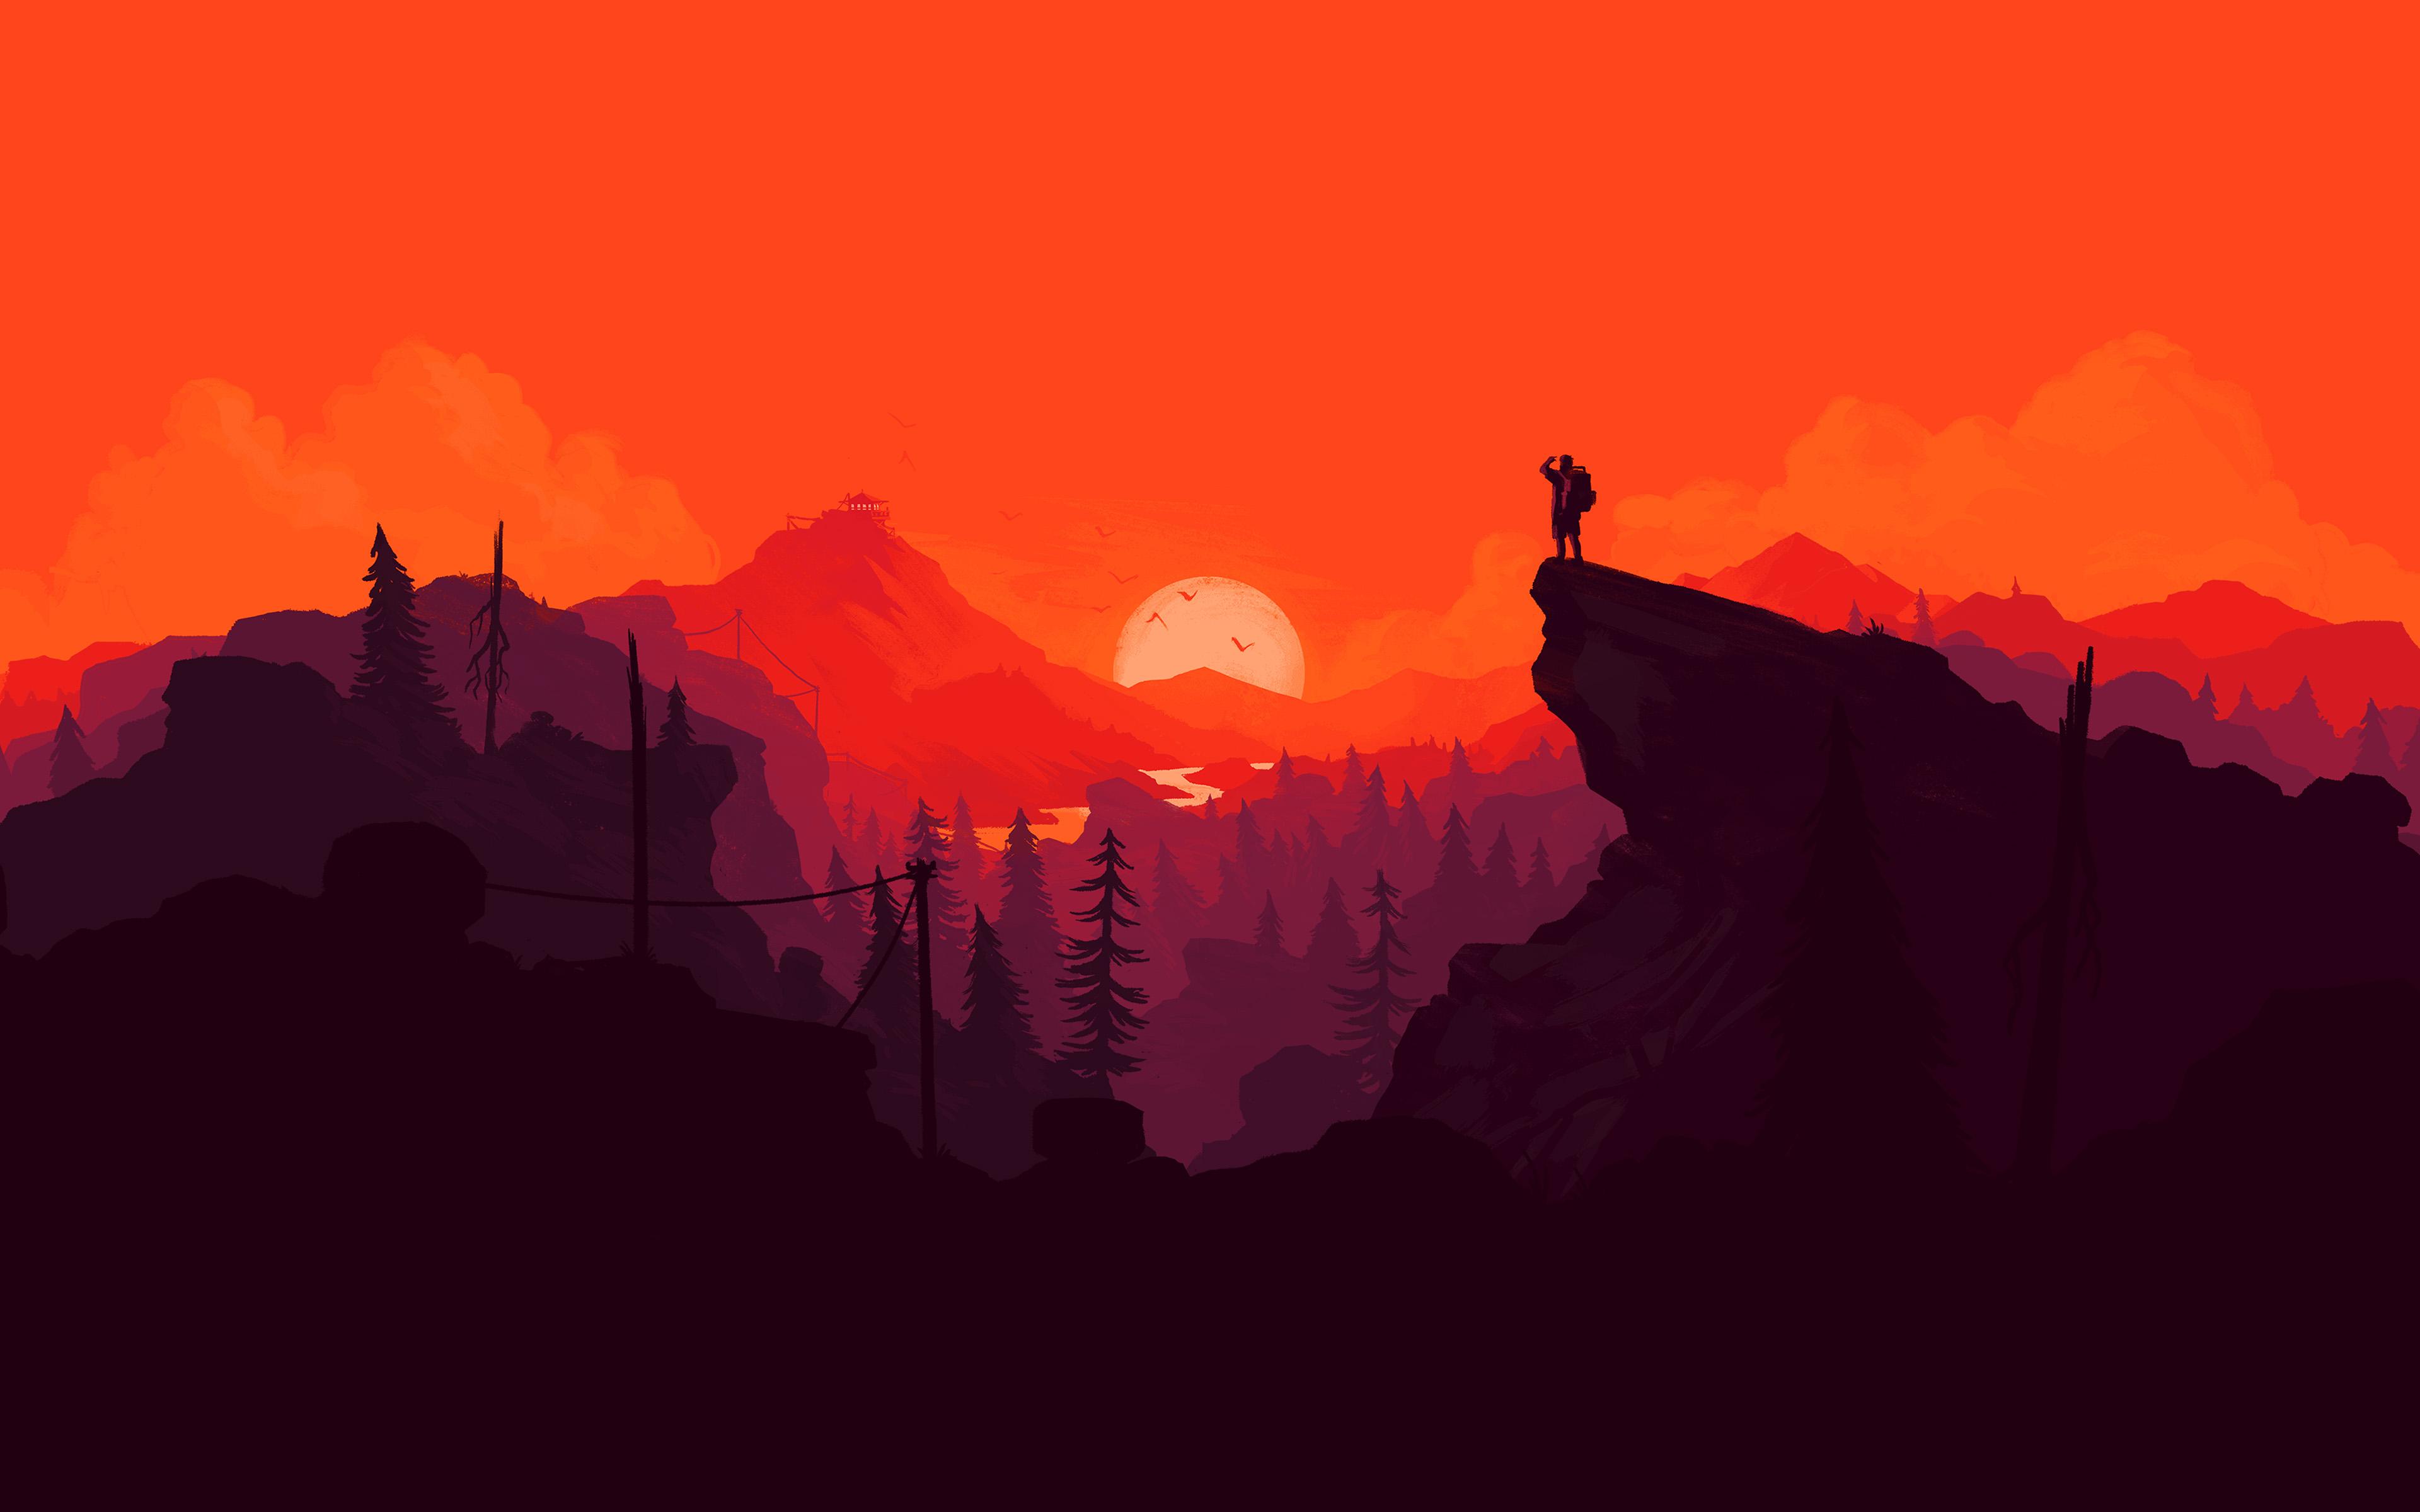 2560x1080 Fall Mountain Wallpaper Au35 Nature Sunset Simple Minimal Illustration Art Red